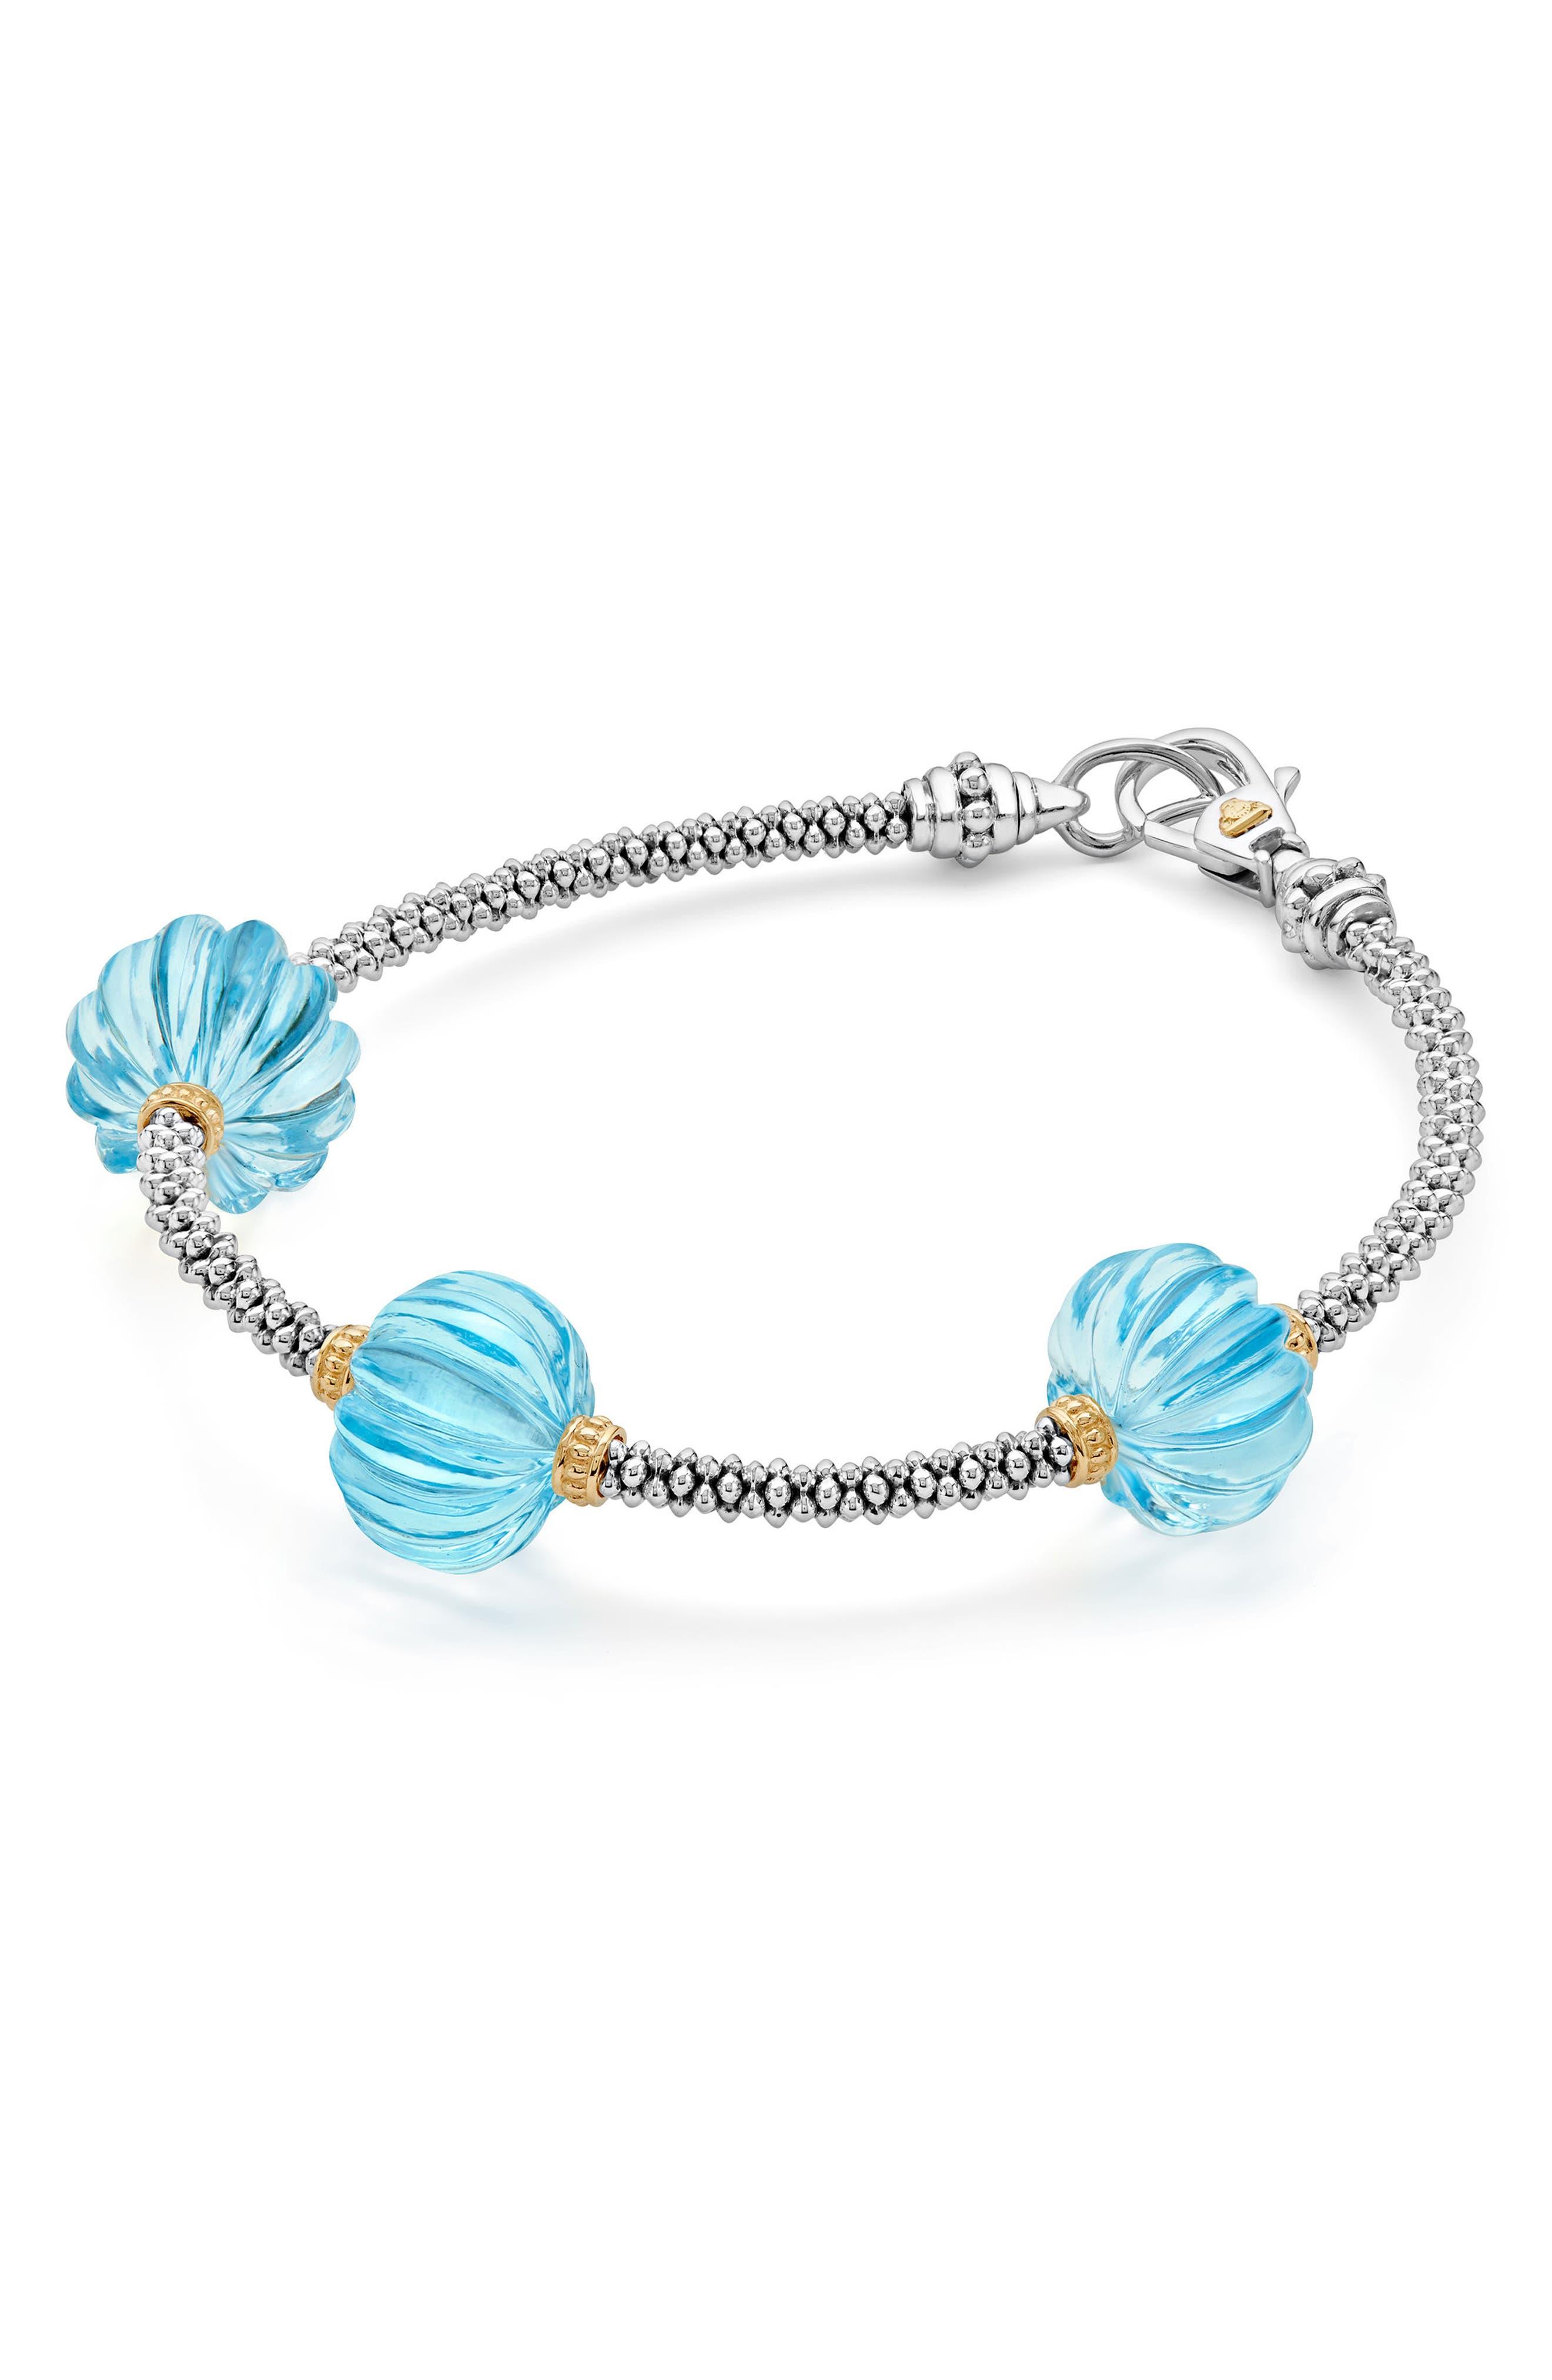 Caviar Forever Melon Bead Station Bracelet,                             Alternate thumbnail 3, color,                             Silver/ Sky Blue Topaz